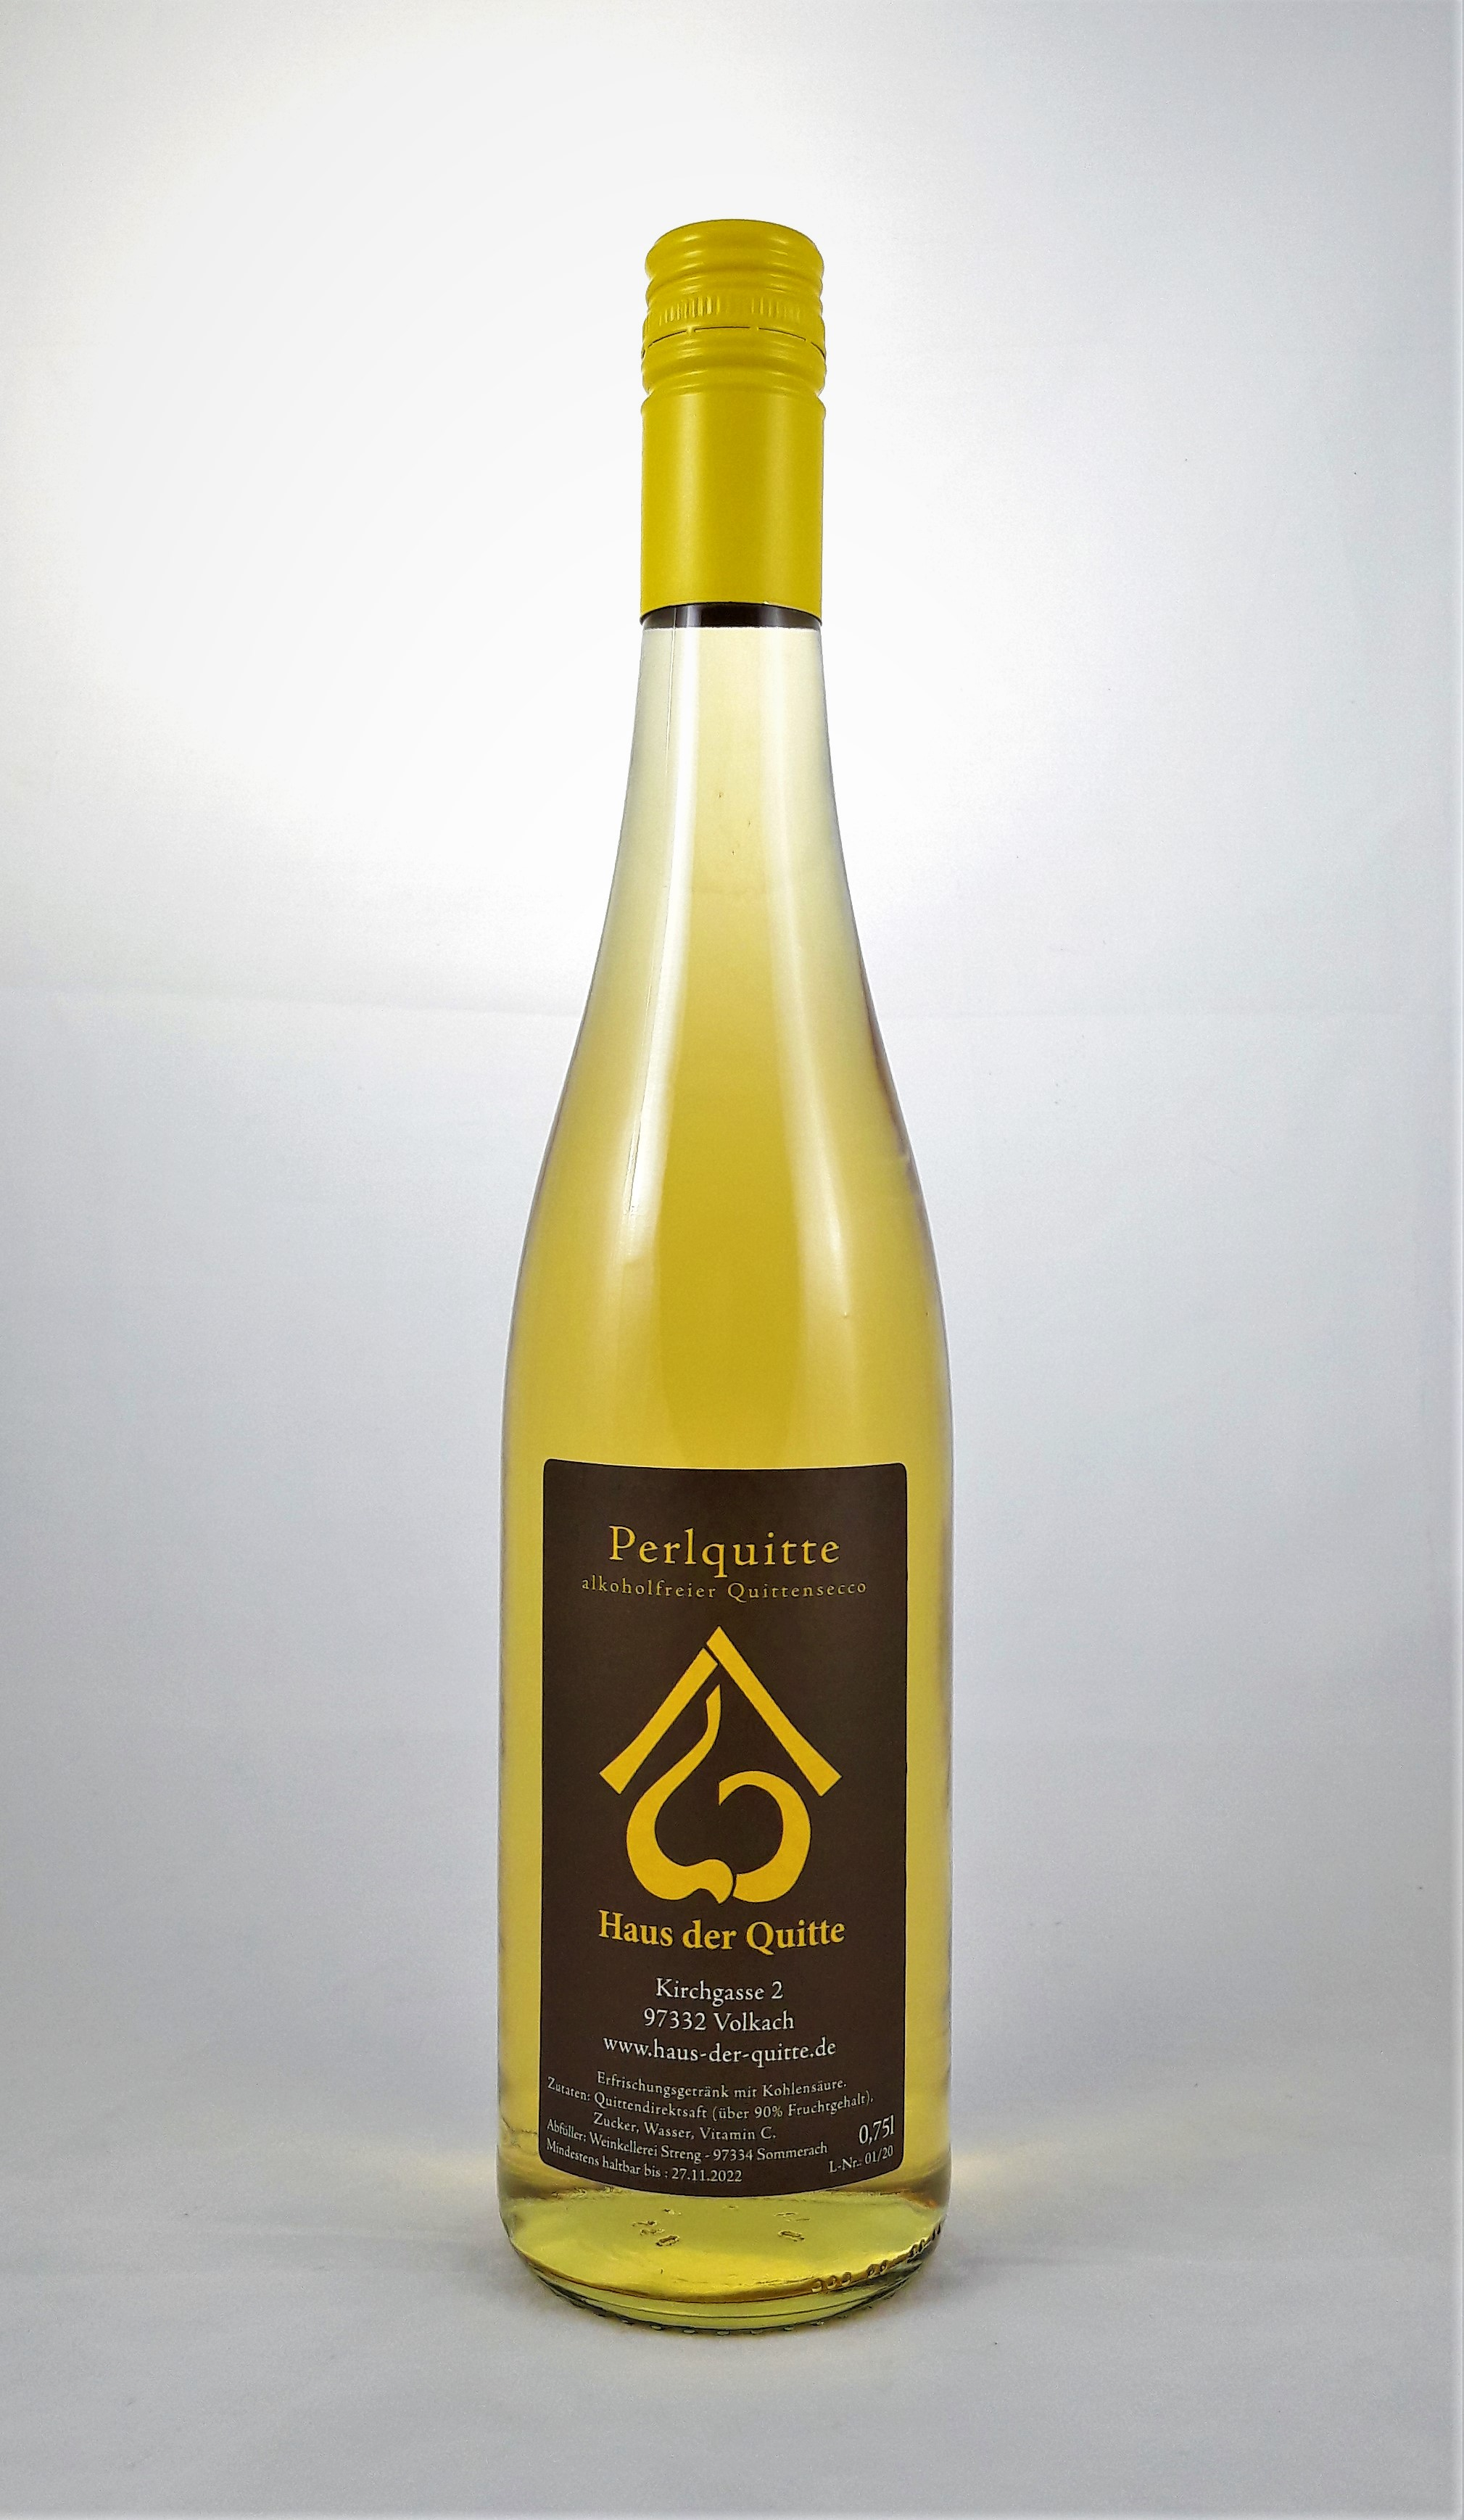 Perlquitte, alkoholfreier Quittensecco, 0,75 l